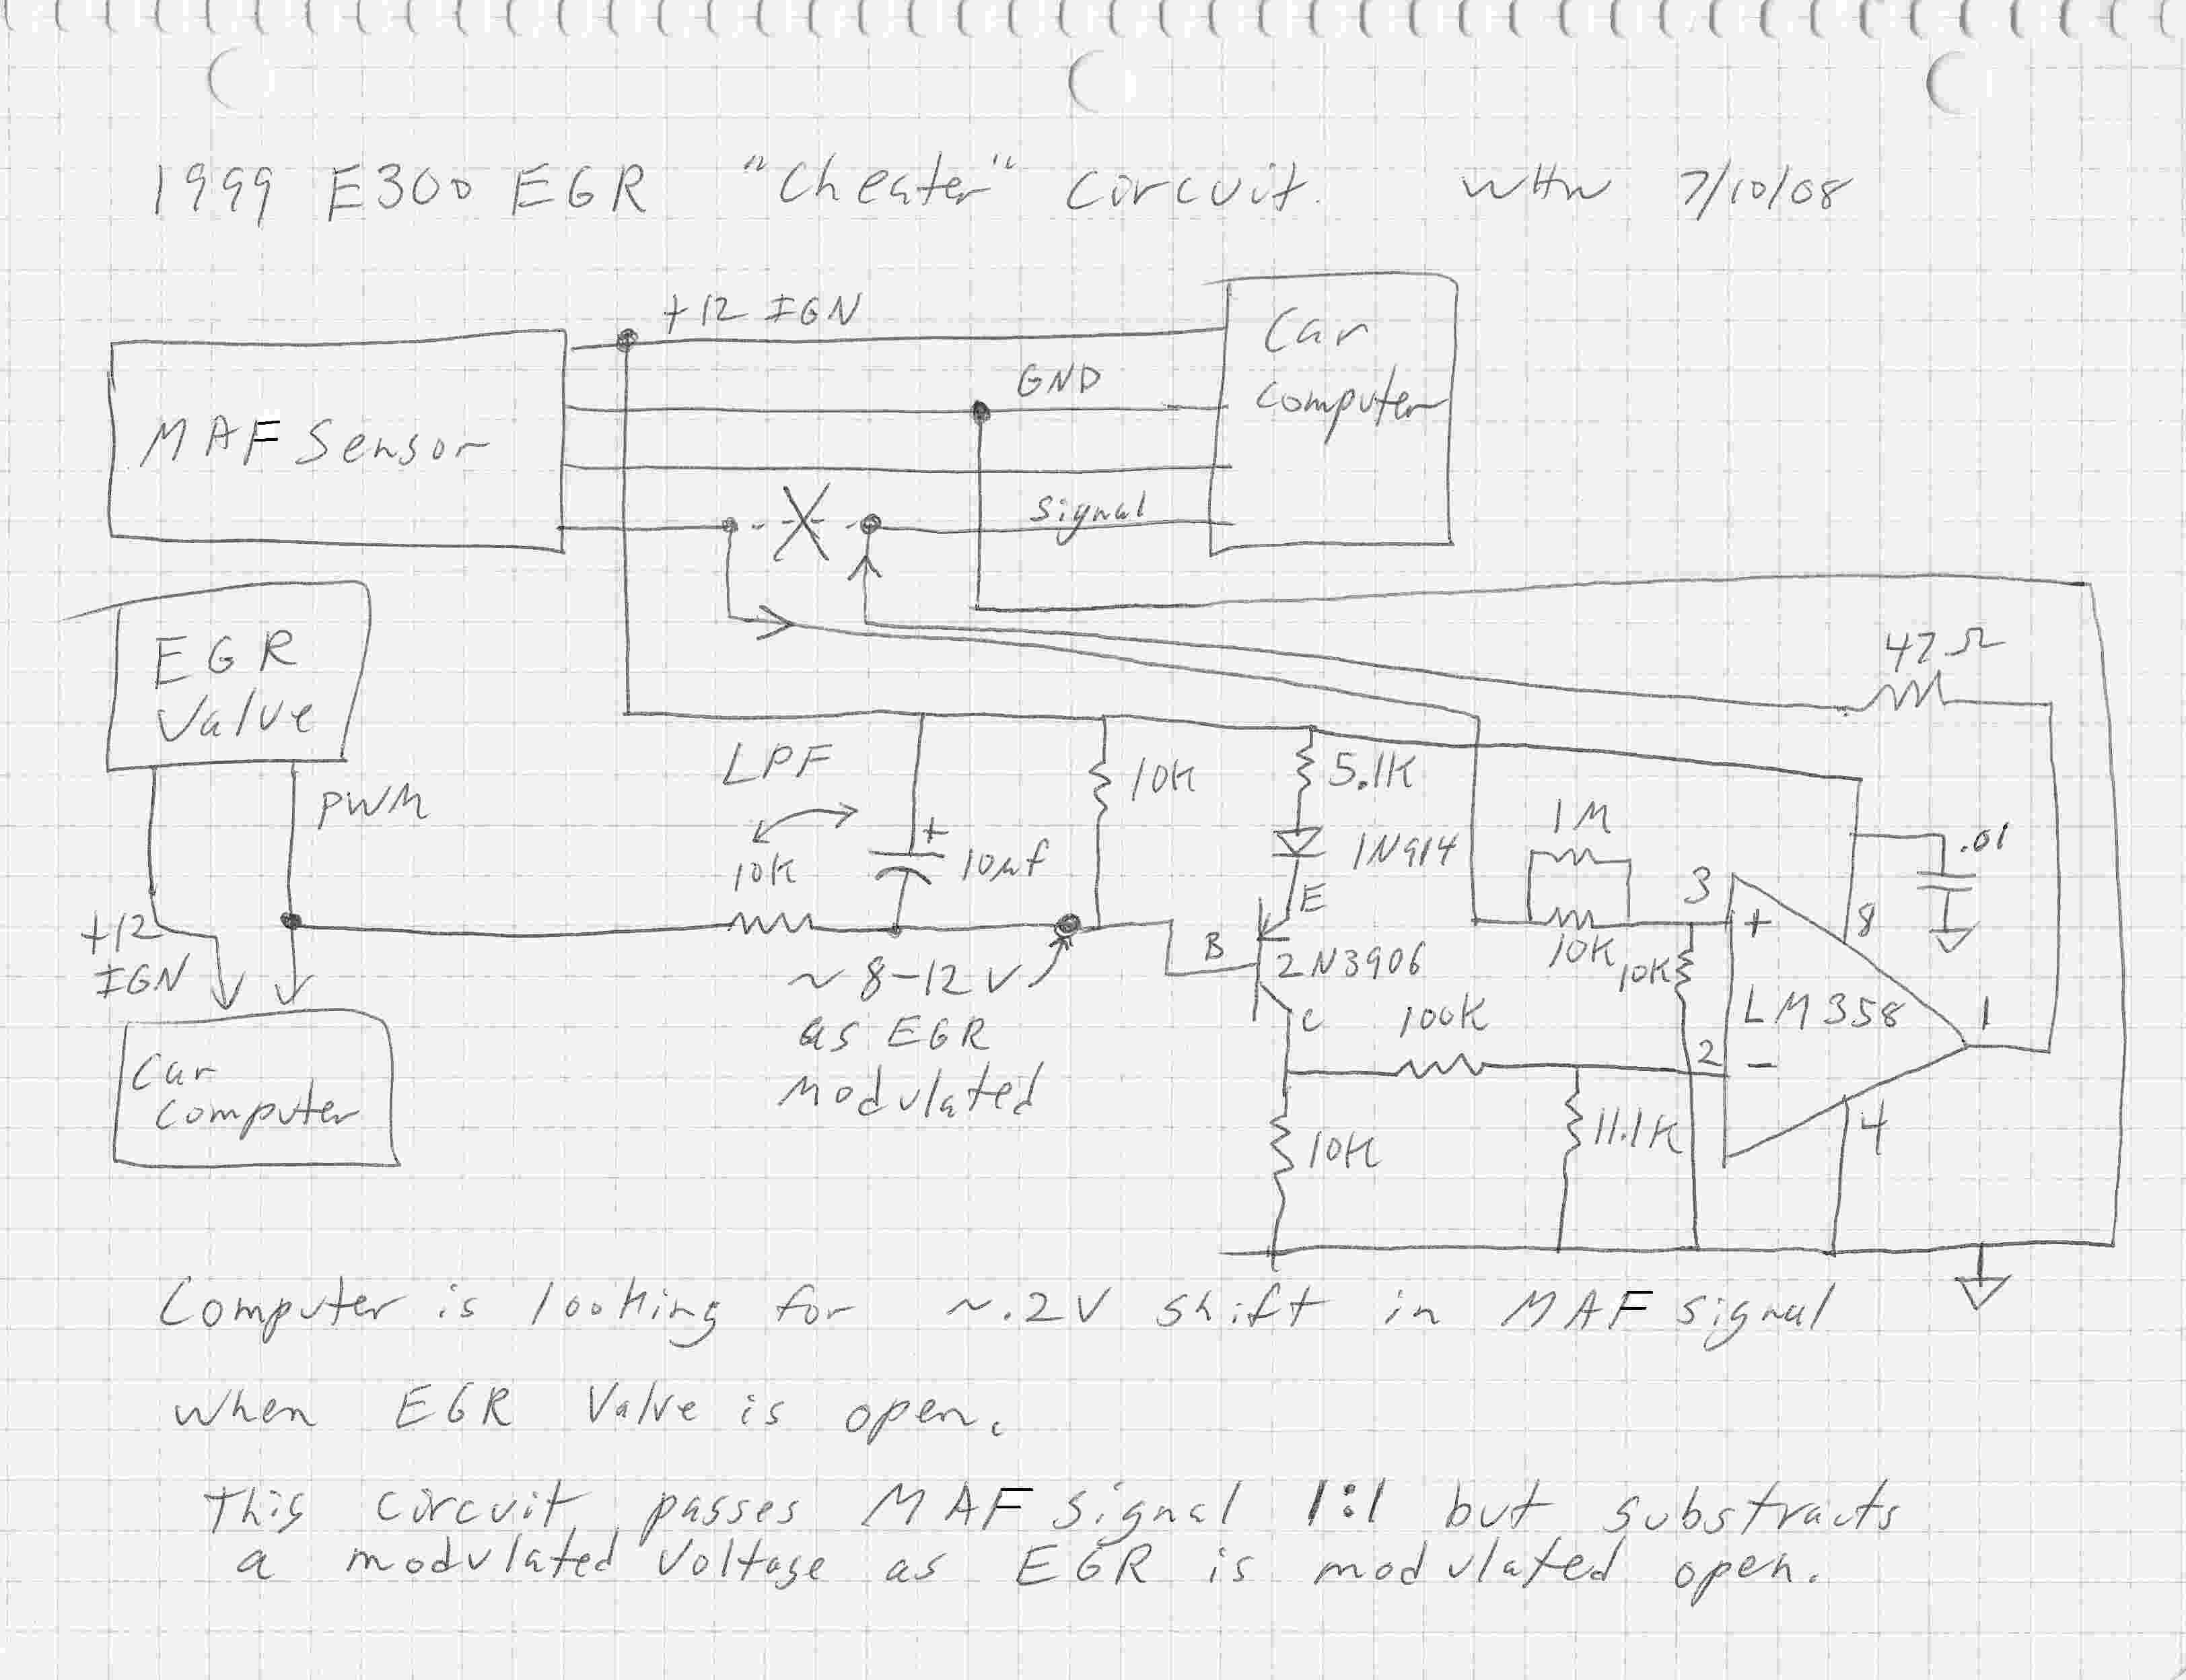 Mbca org sites default files 7007512 egr 20cheater 20circuit7